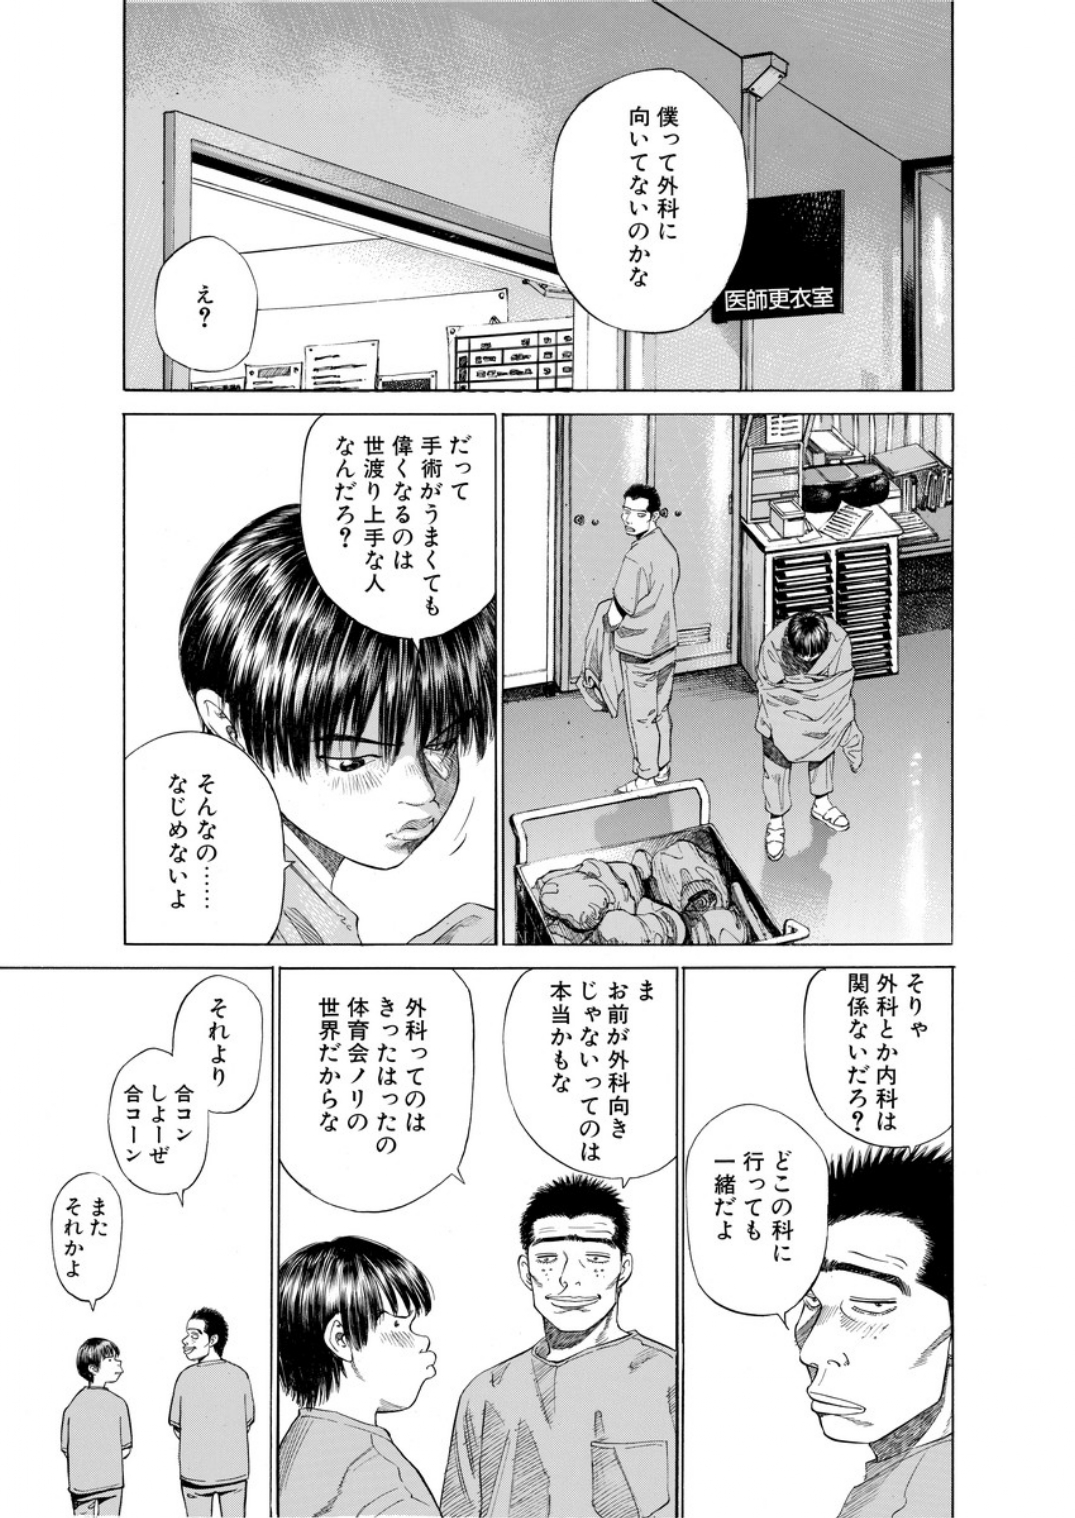 001bj_page-0155.jpg